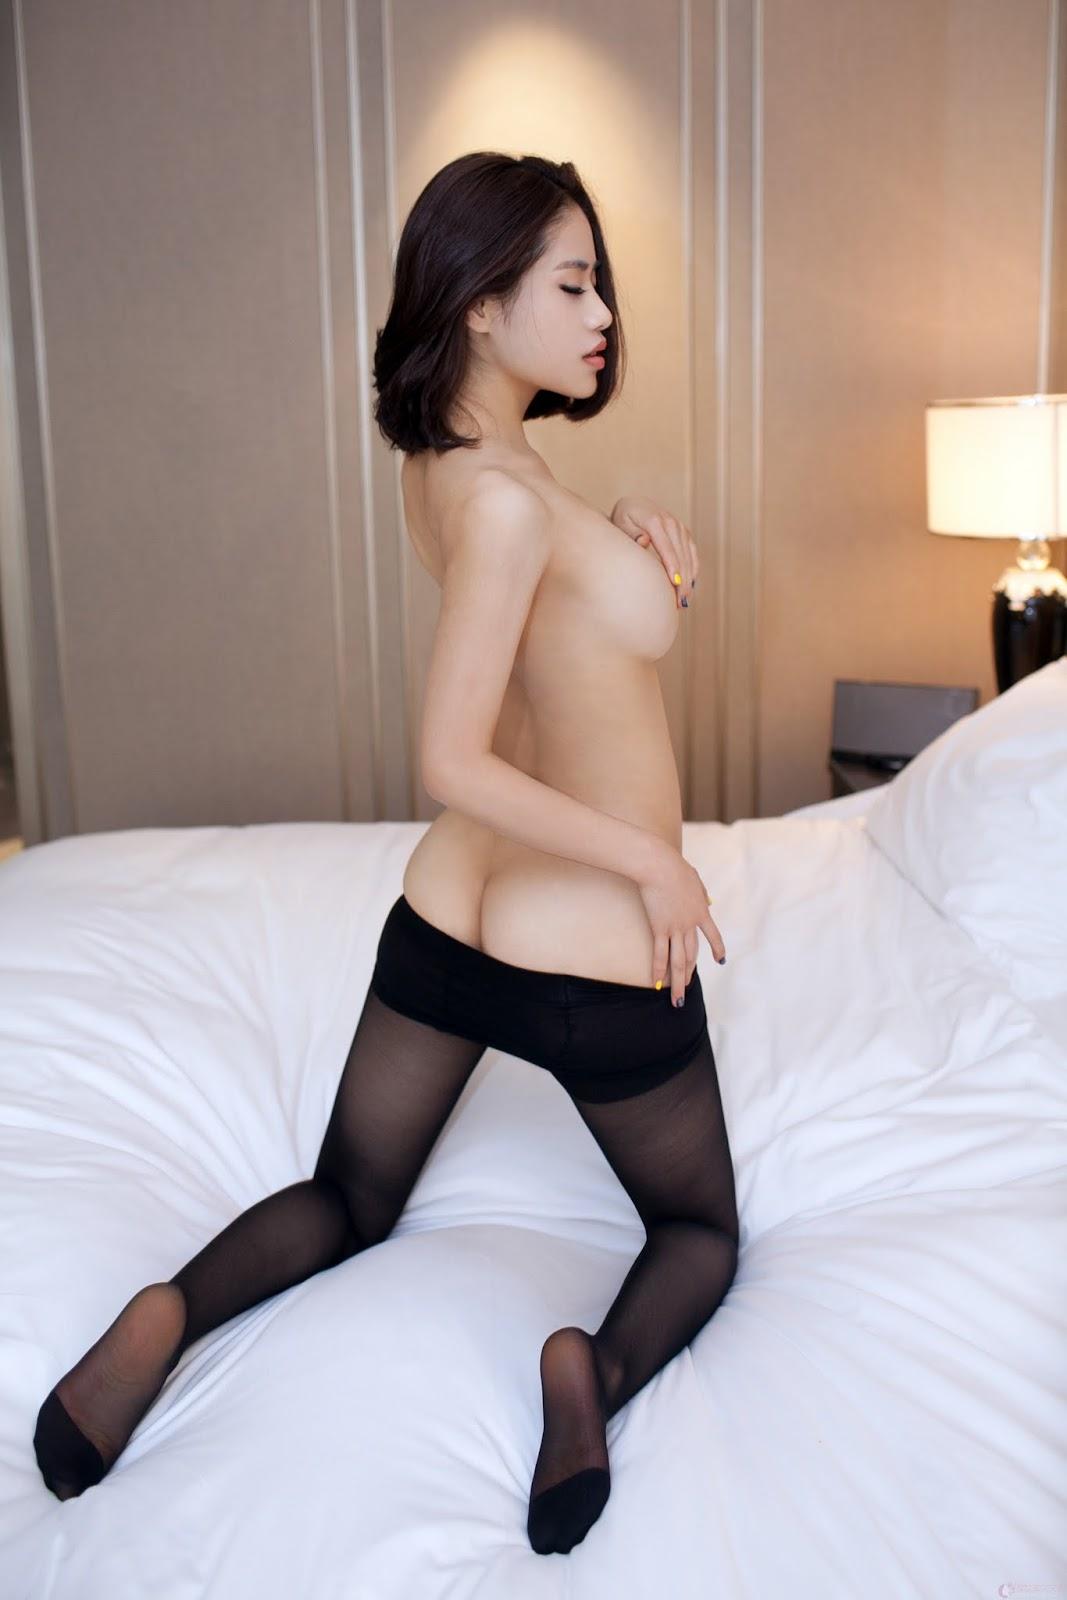 %252B%25C2%25A6%252B%2529%2B%252805%2529 - Hot Girl TUIGIRL NO.53 Sexy